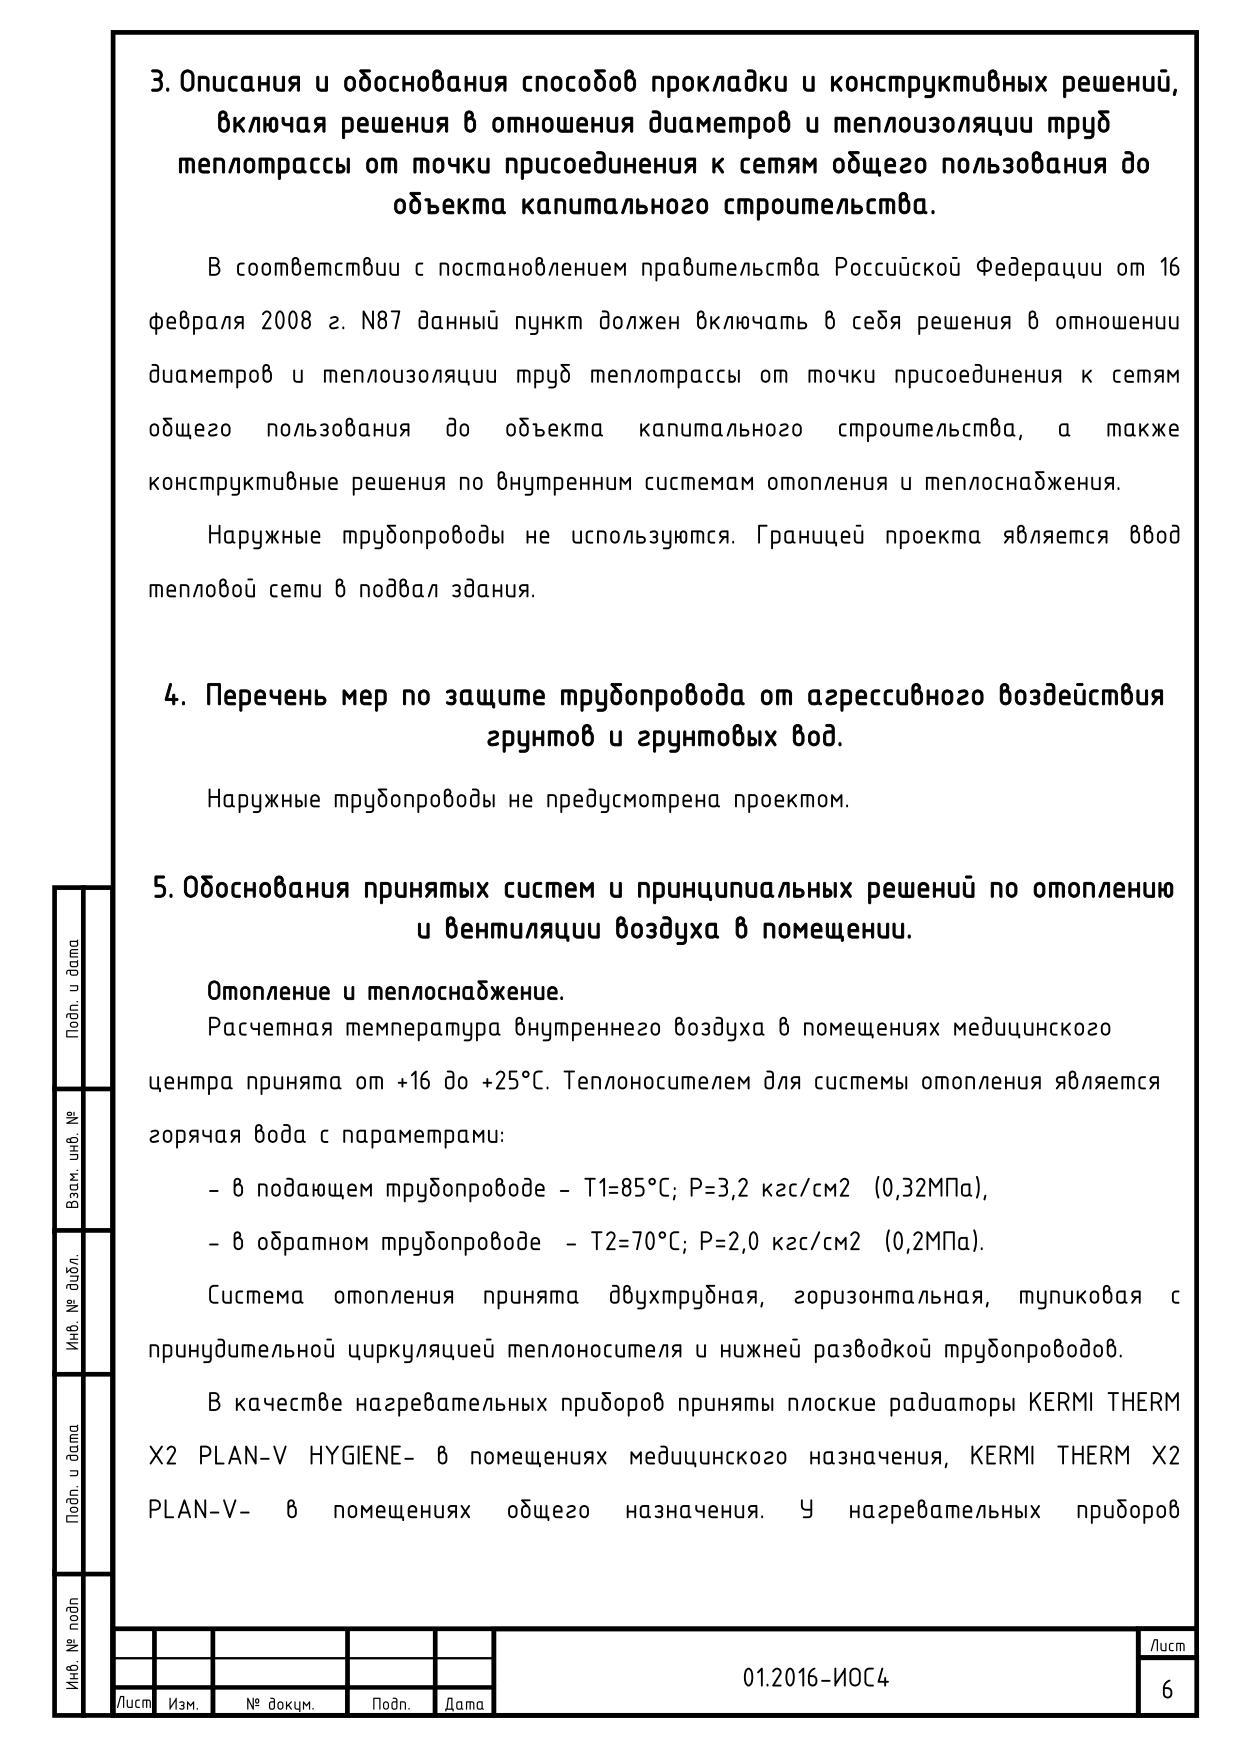 Депо 12-36-577